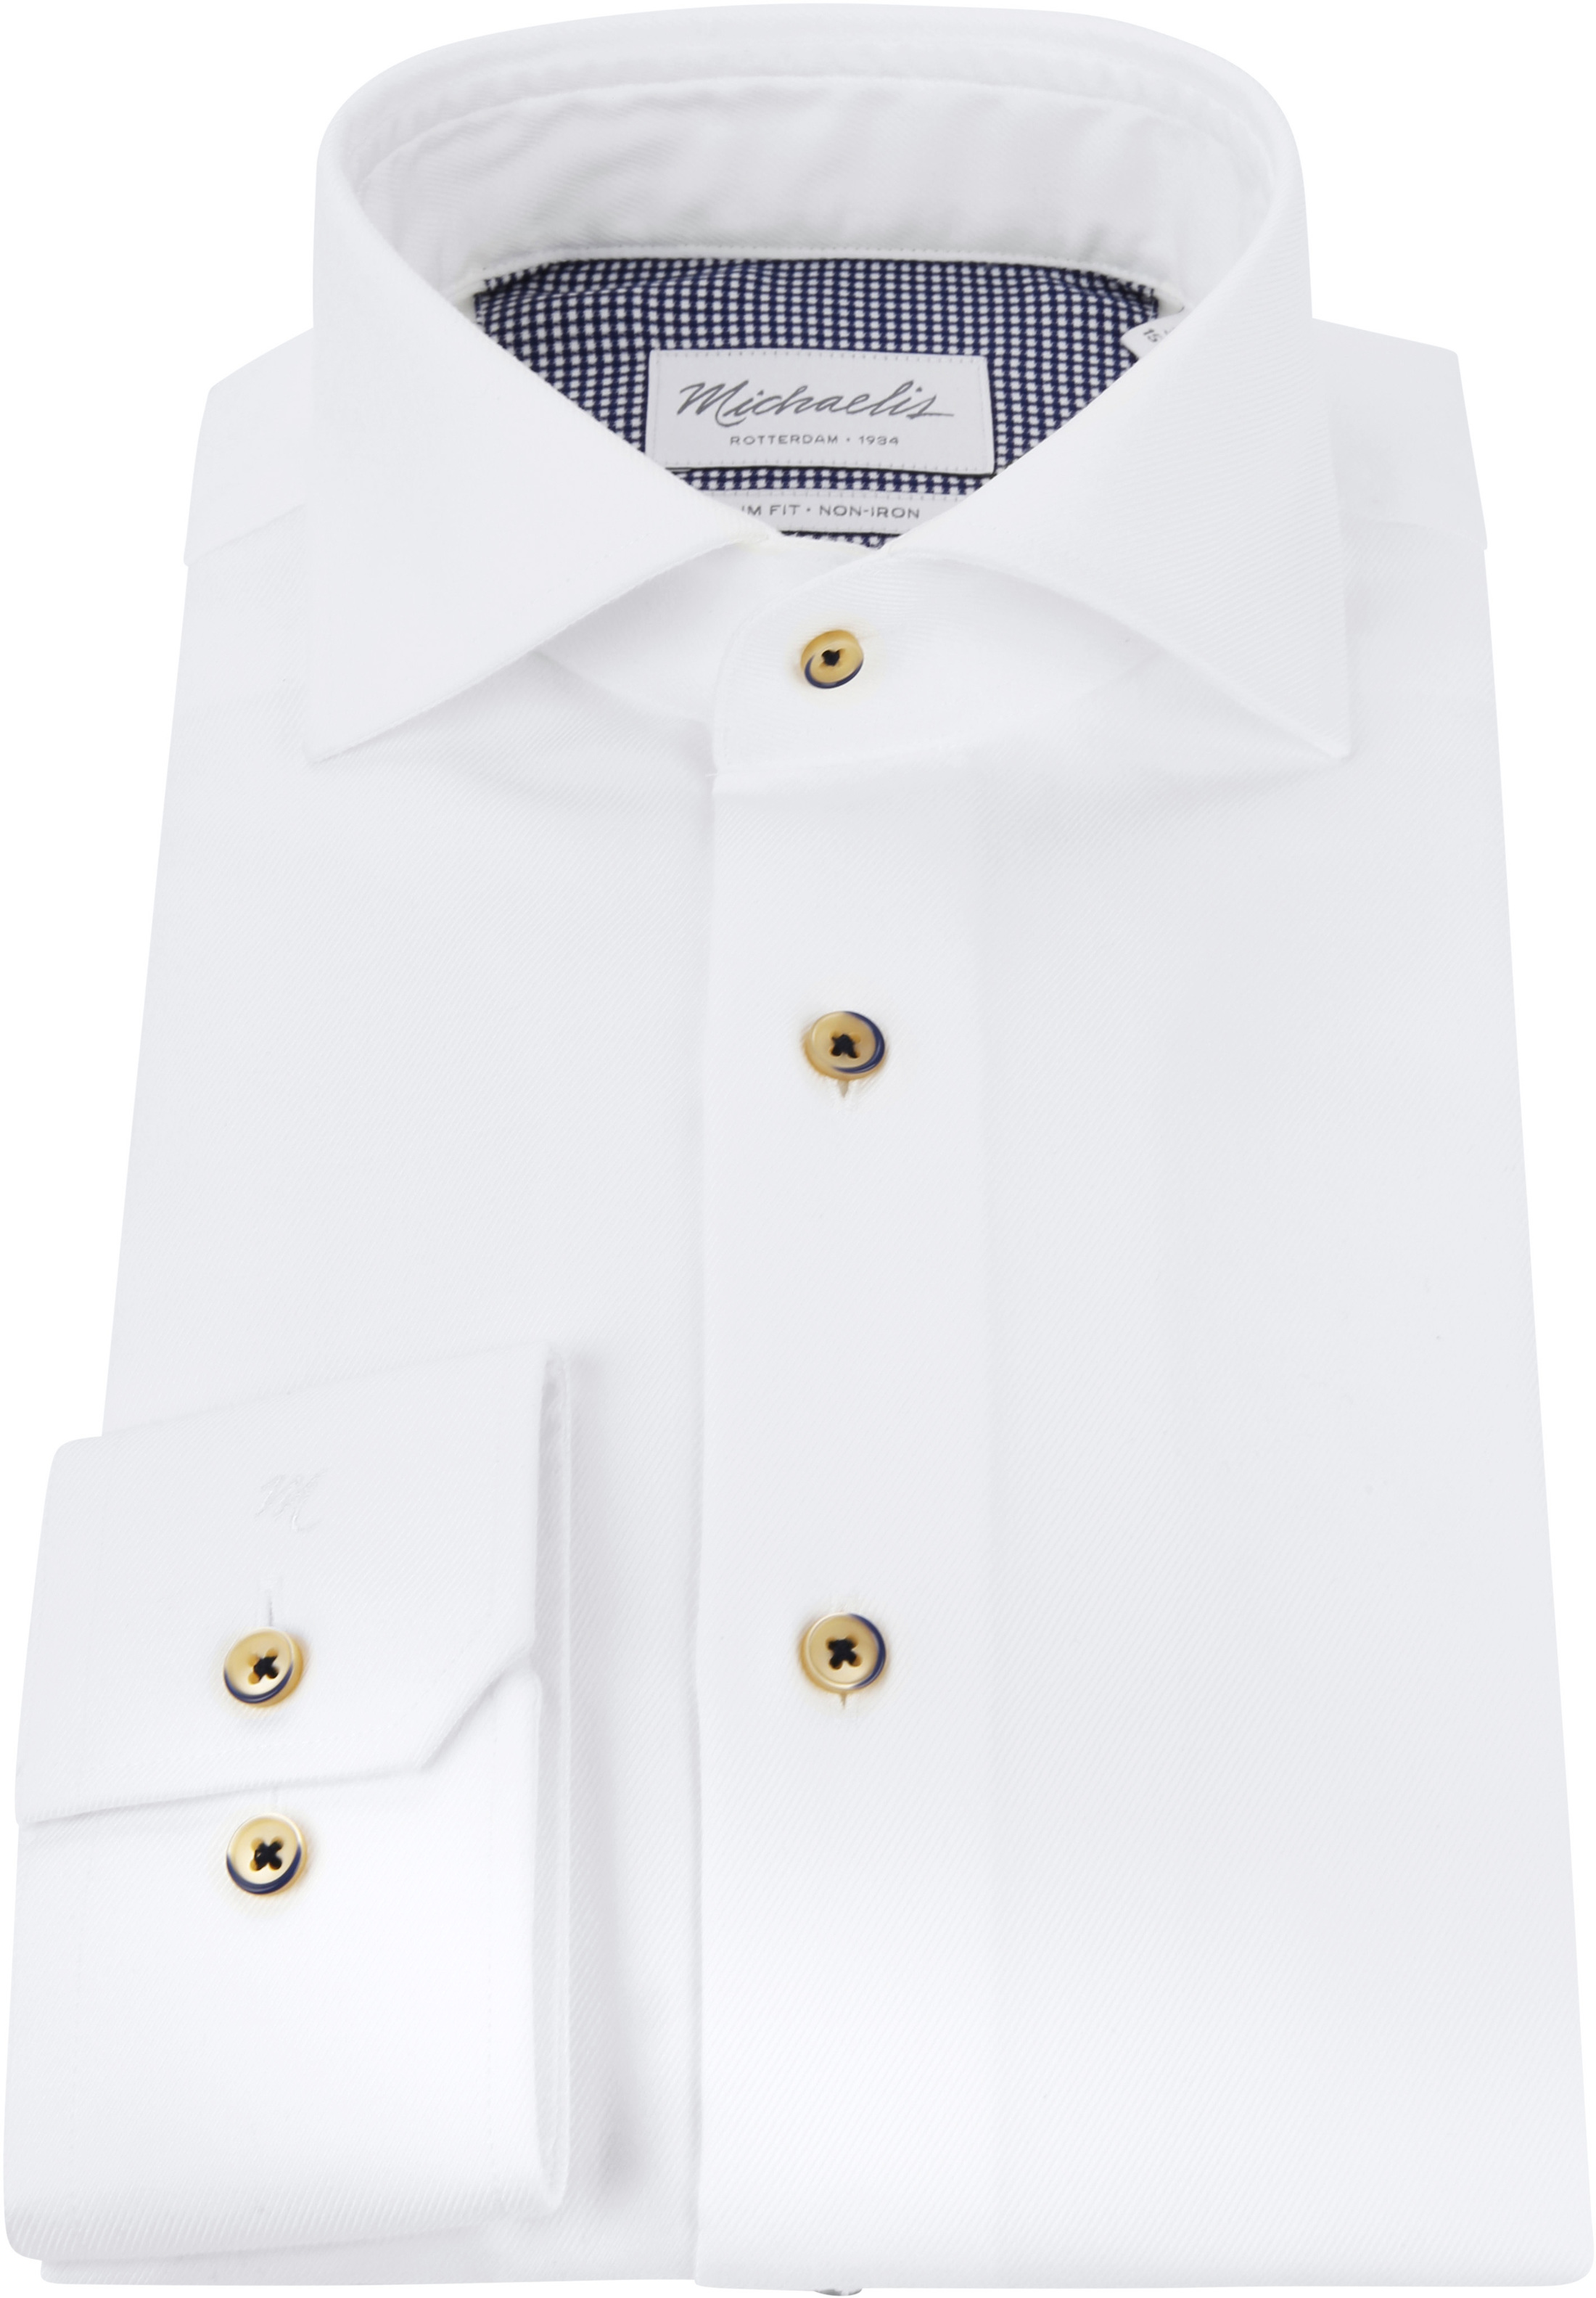 Michaelis Overhemd Twill Strijkvrij Wit foto 2